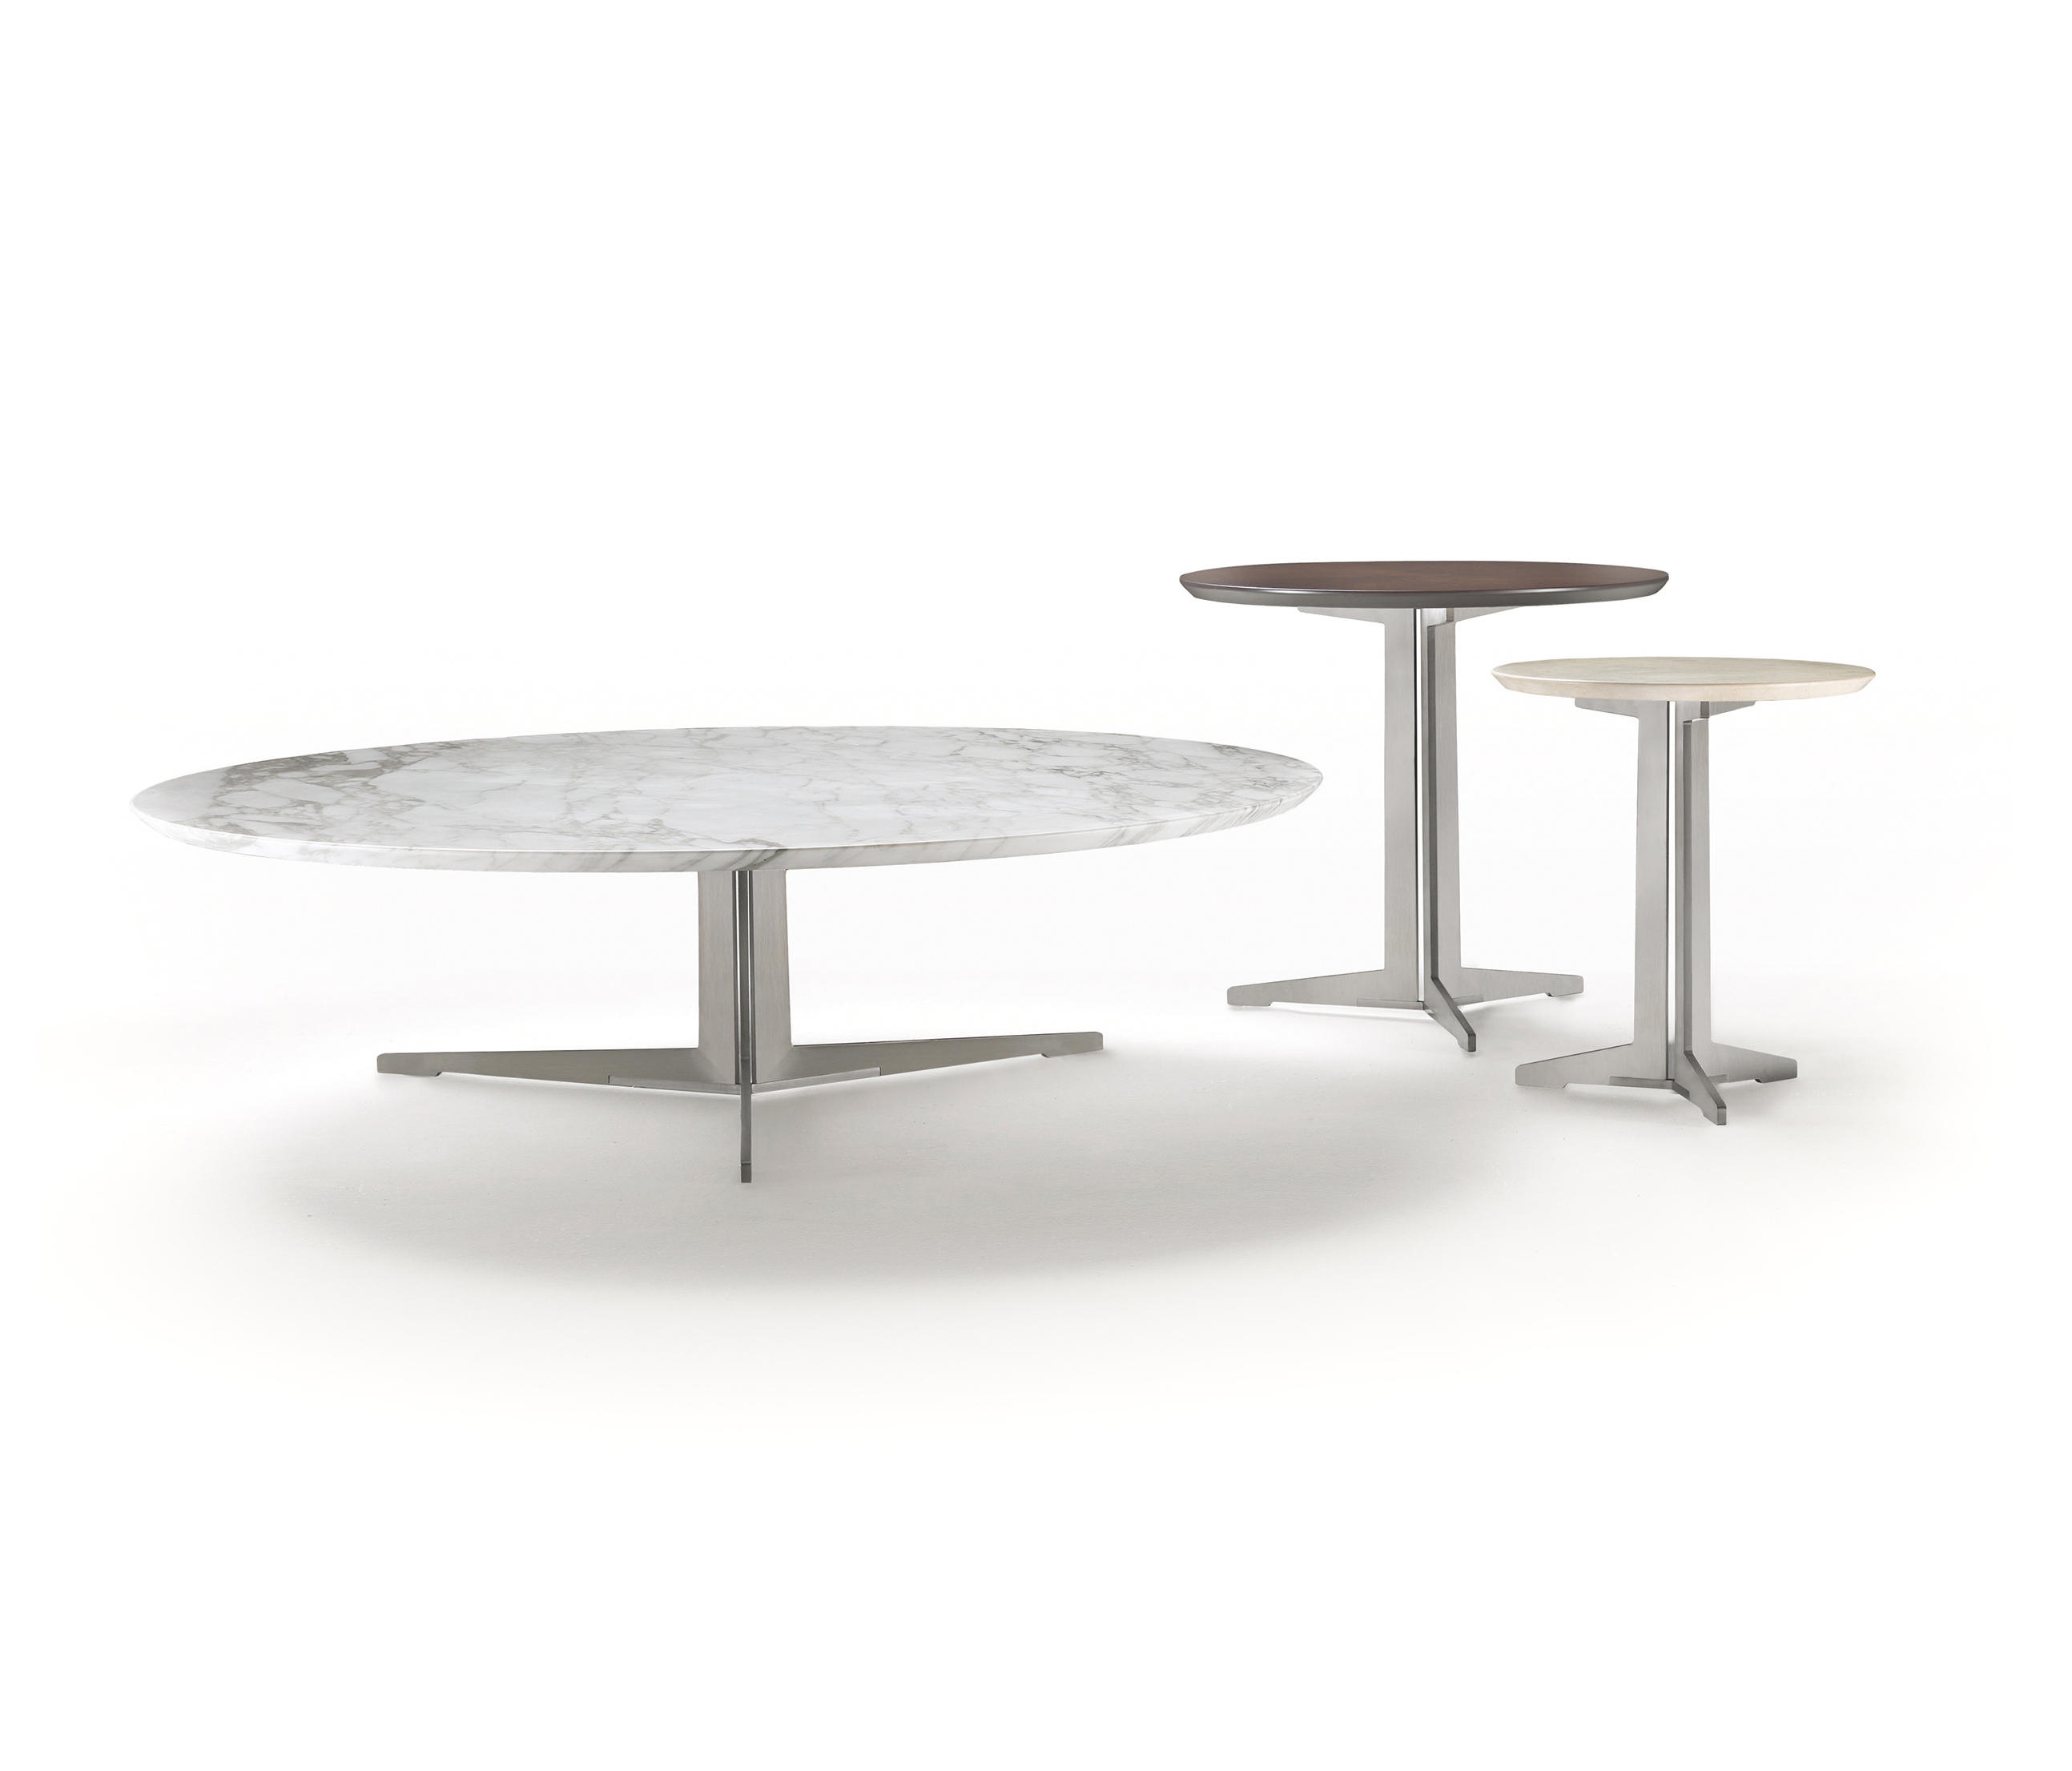 table de jardin fly cuisine dessin fly table cuisine. Black Bedroom Furniture Sets. Home Design Ideas